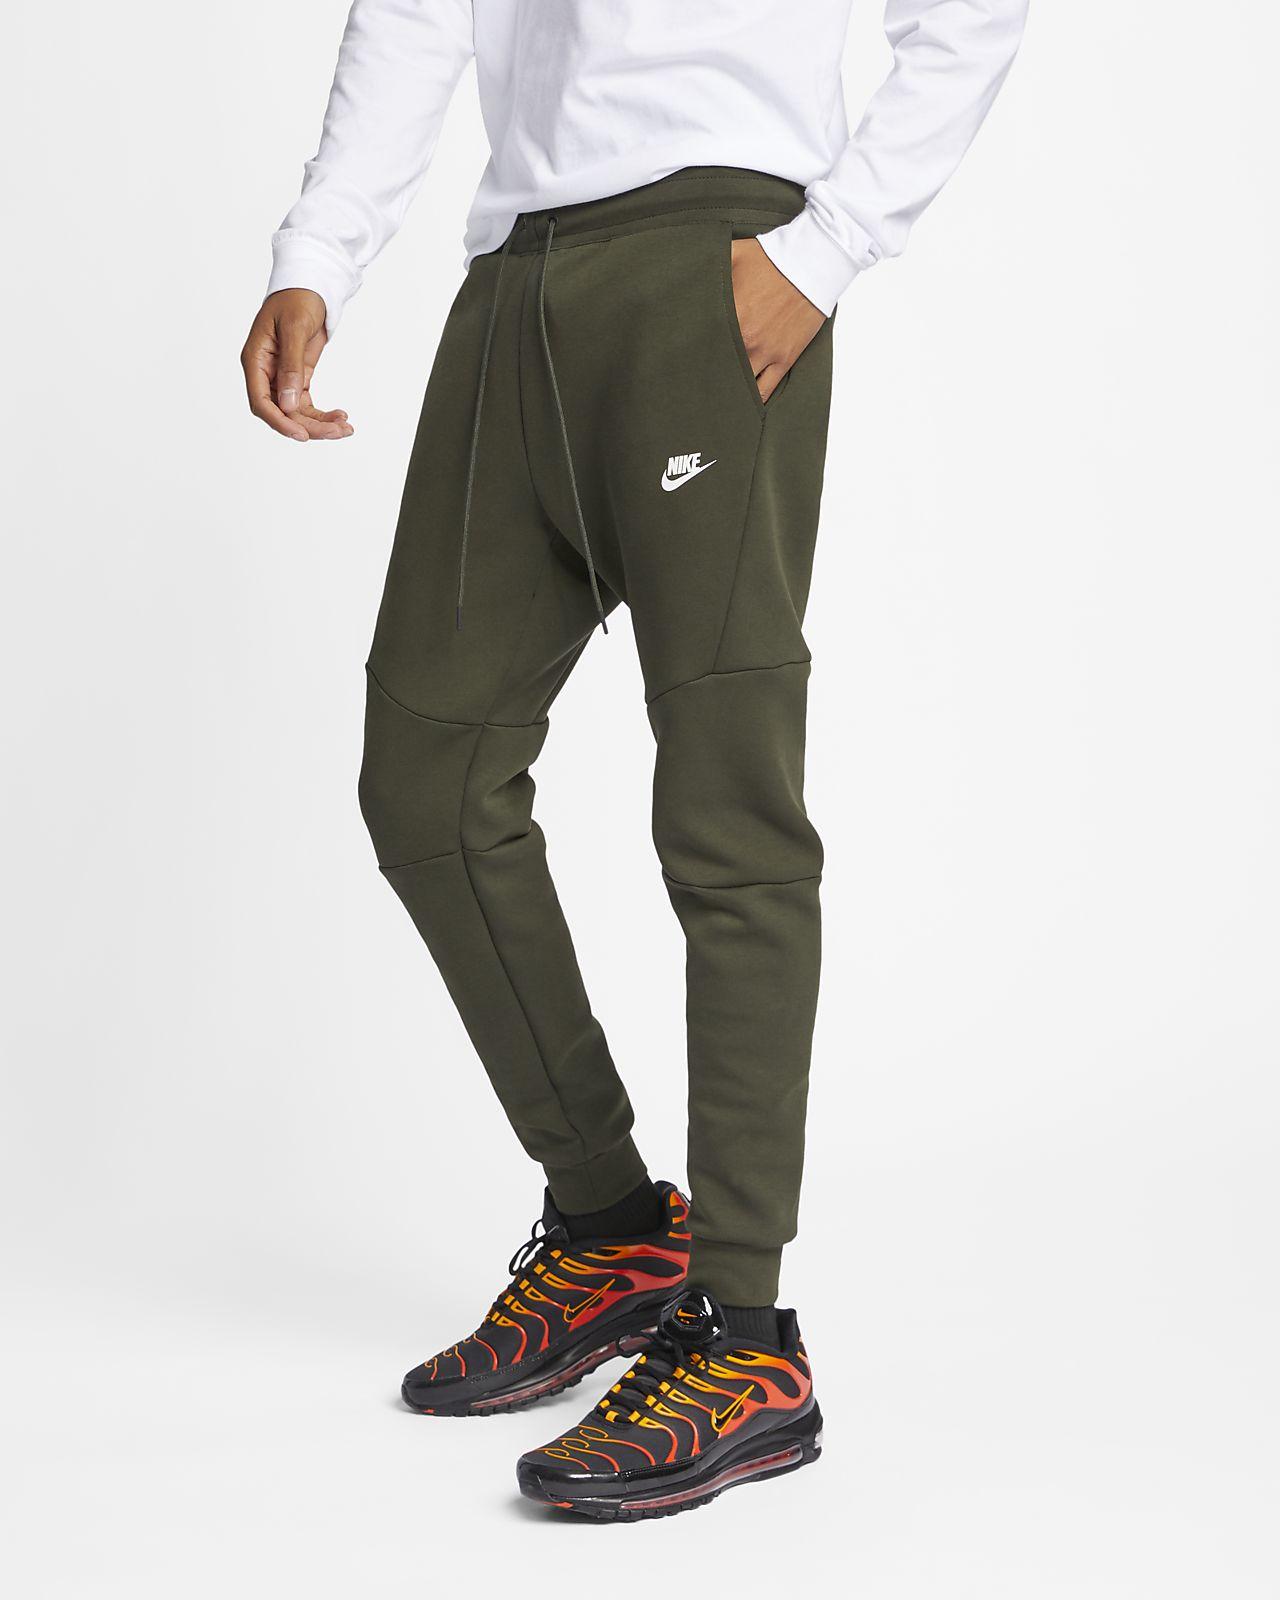 wholesale dealer ce249 b440b ... Pantalon de jogging Nike Sportswear Tech Fleece pour Homme. Low  Resolution undefined